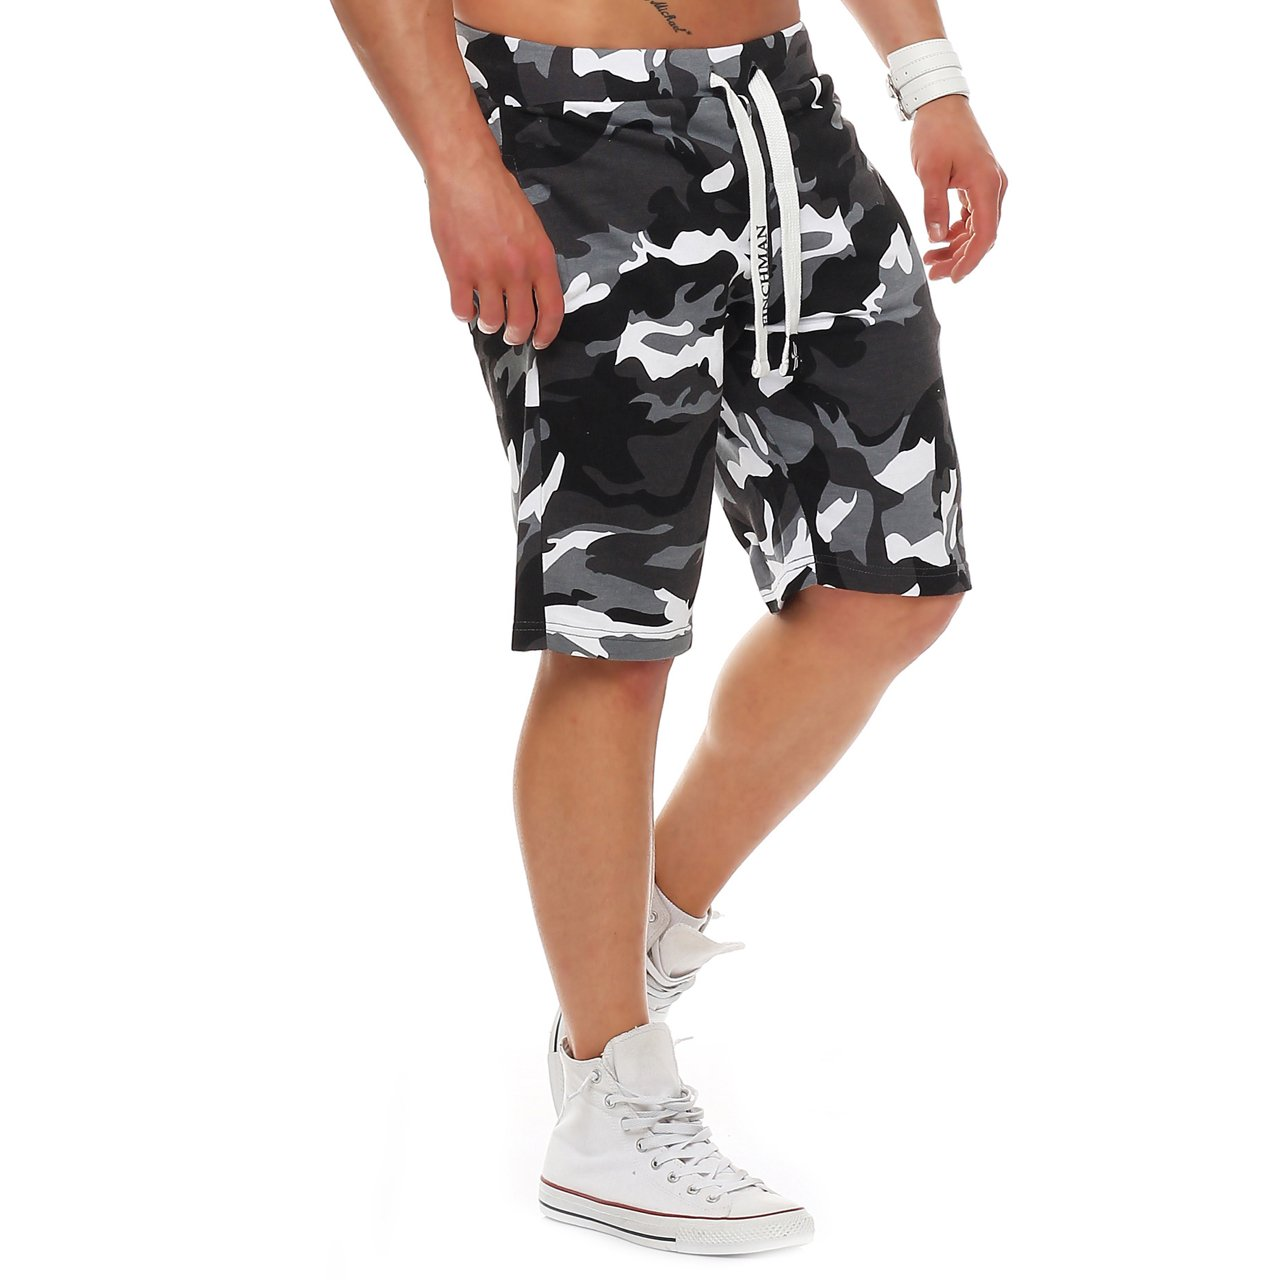 Finchman Mens Cotton Sweat Short Shorts Bermuda Sweatpant